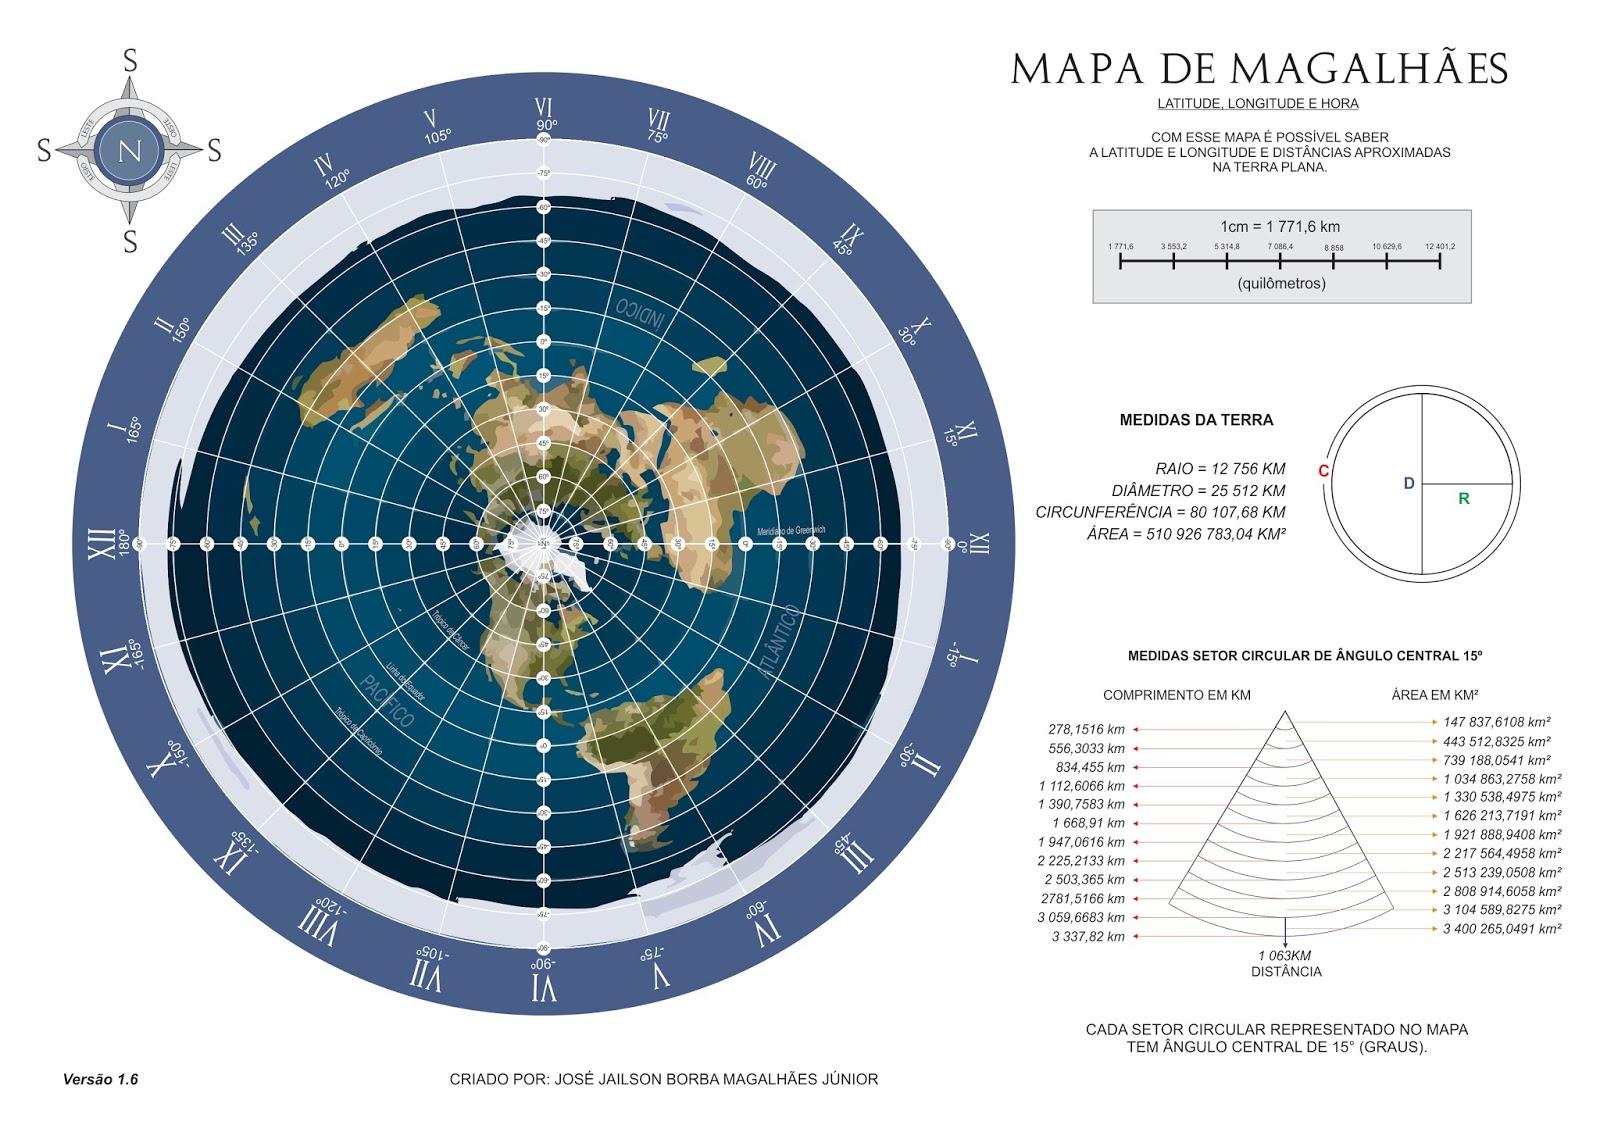 Mapa de Magalhães Modelo Terra Plana